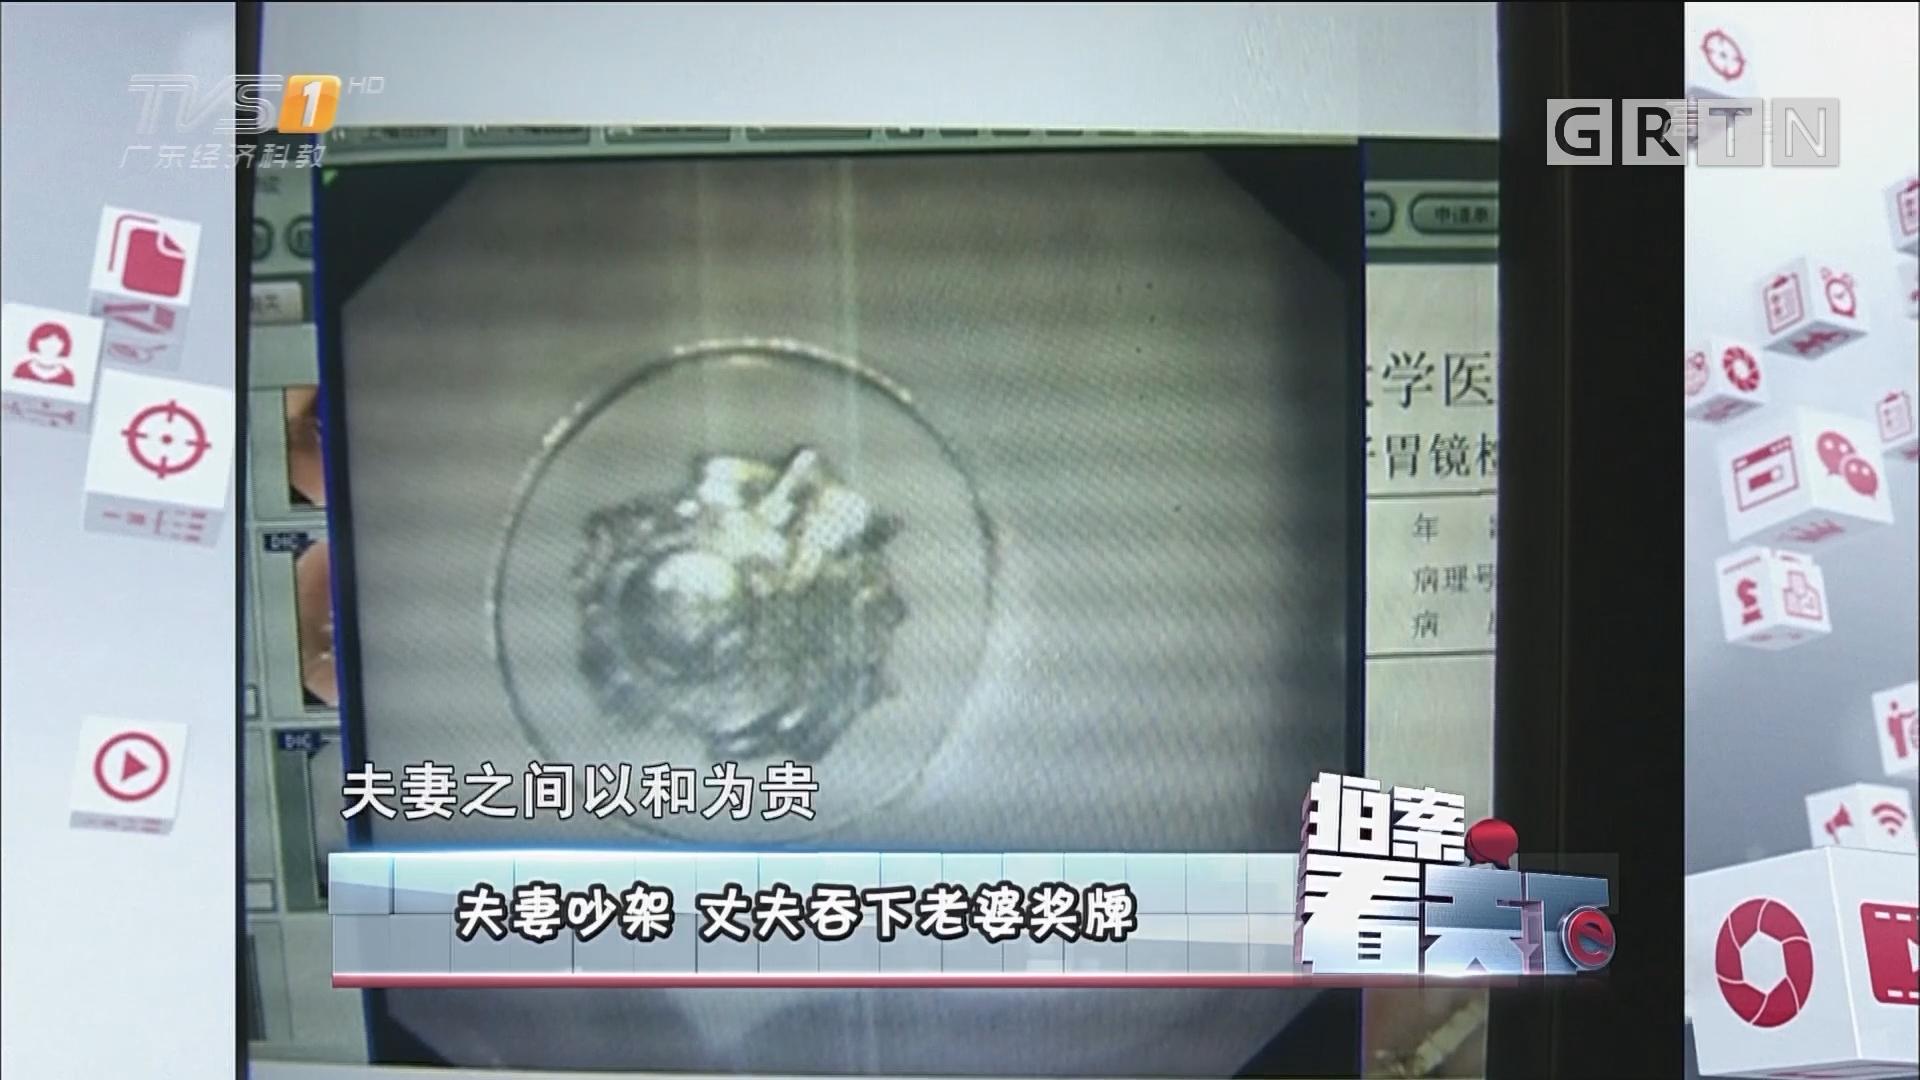 [HD][2017-10-31]拍案看天下:夫妻吵架 丈夫吞下老婆奖牌